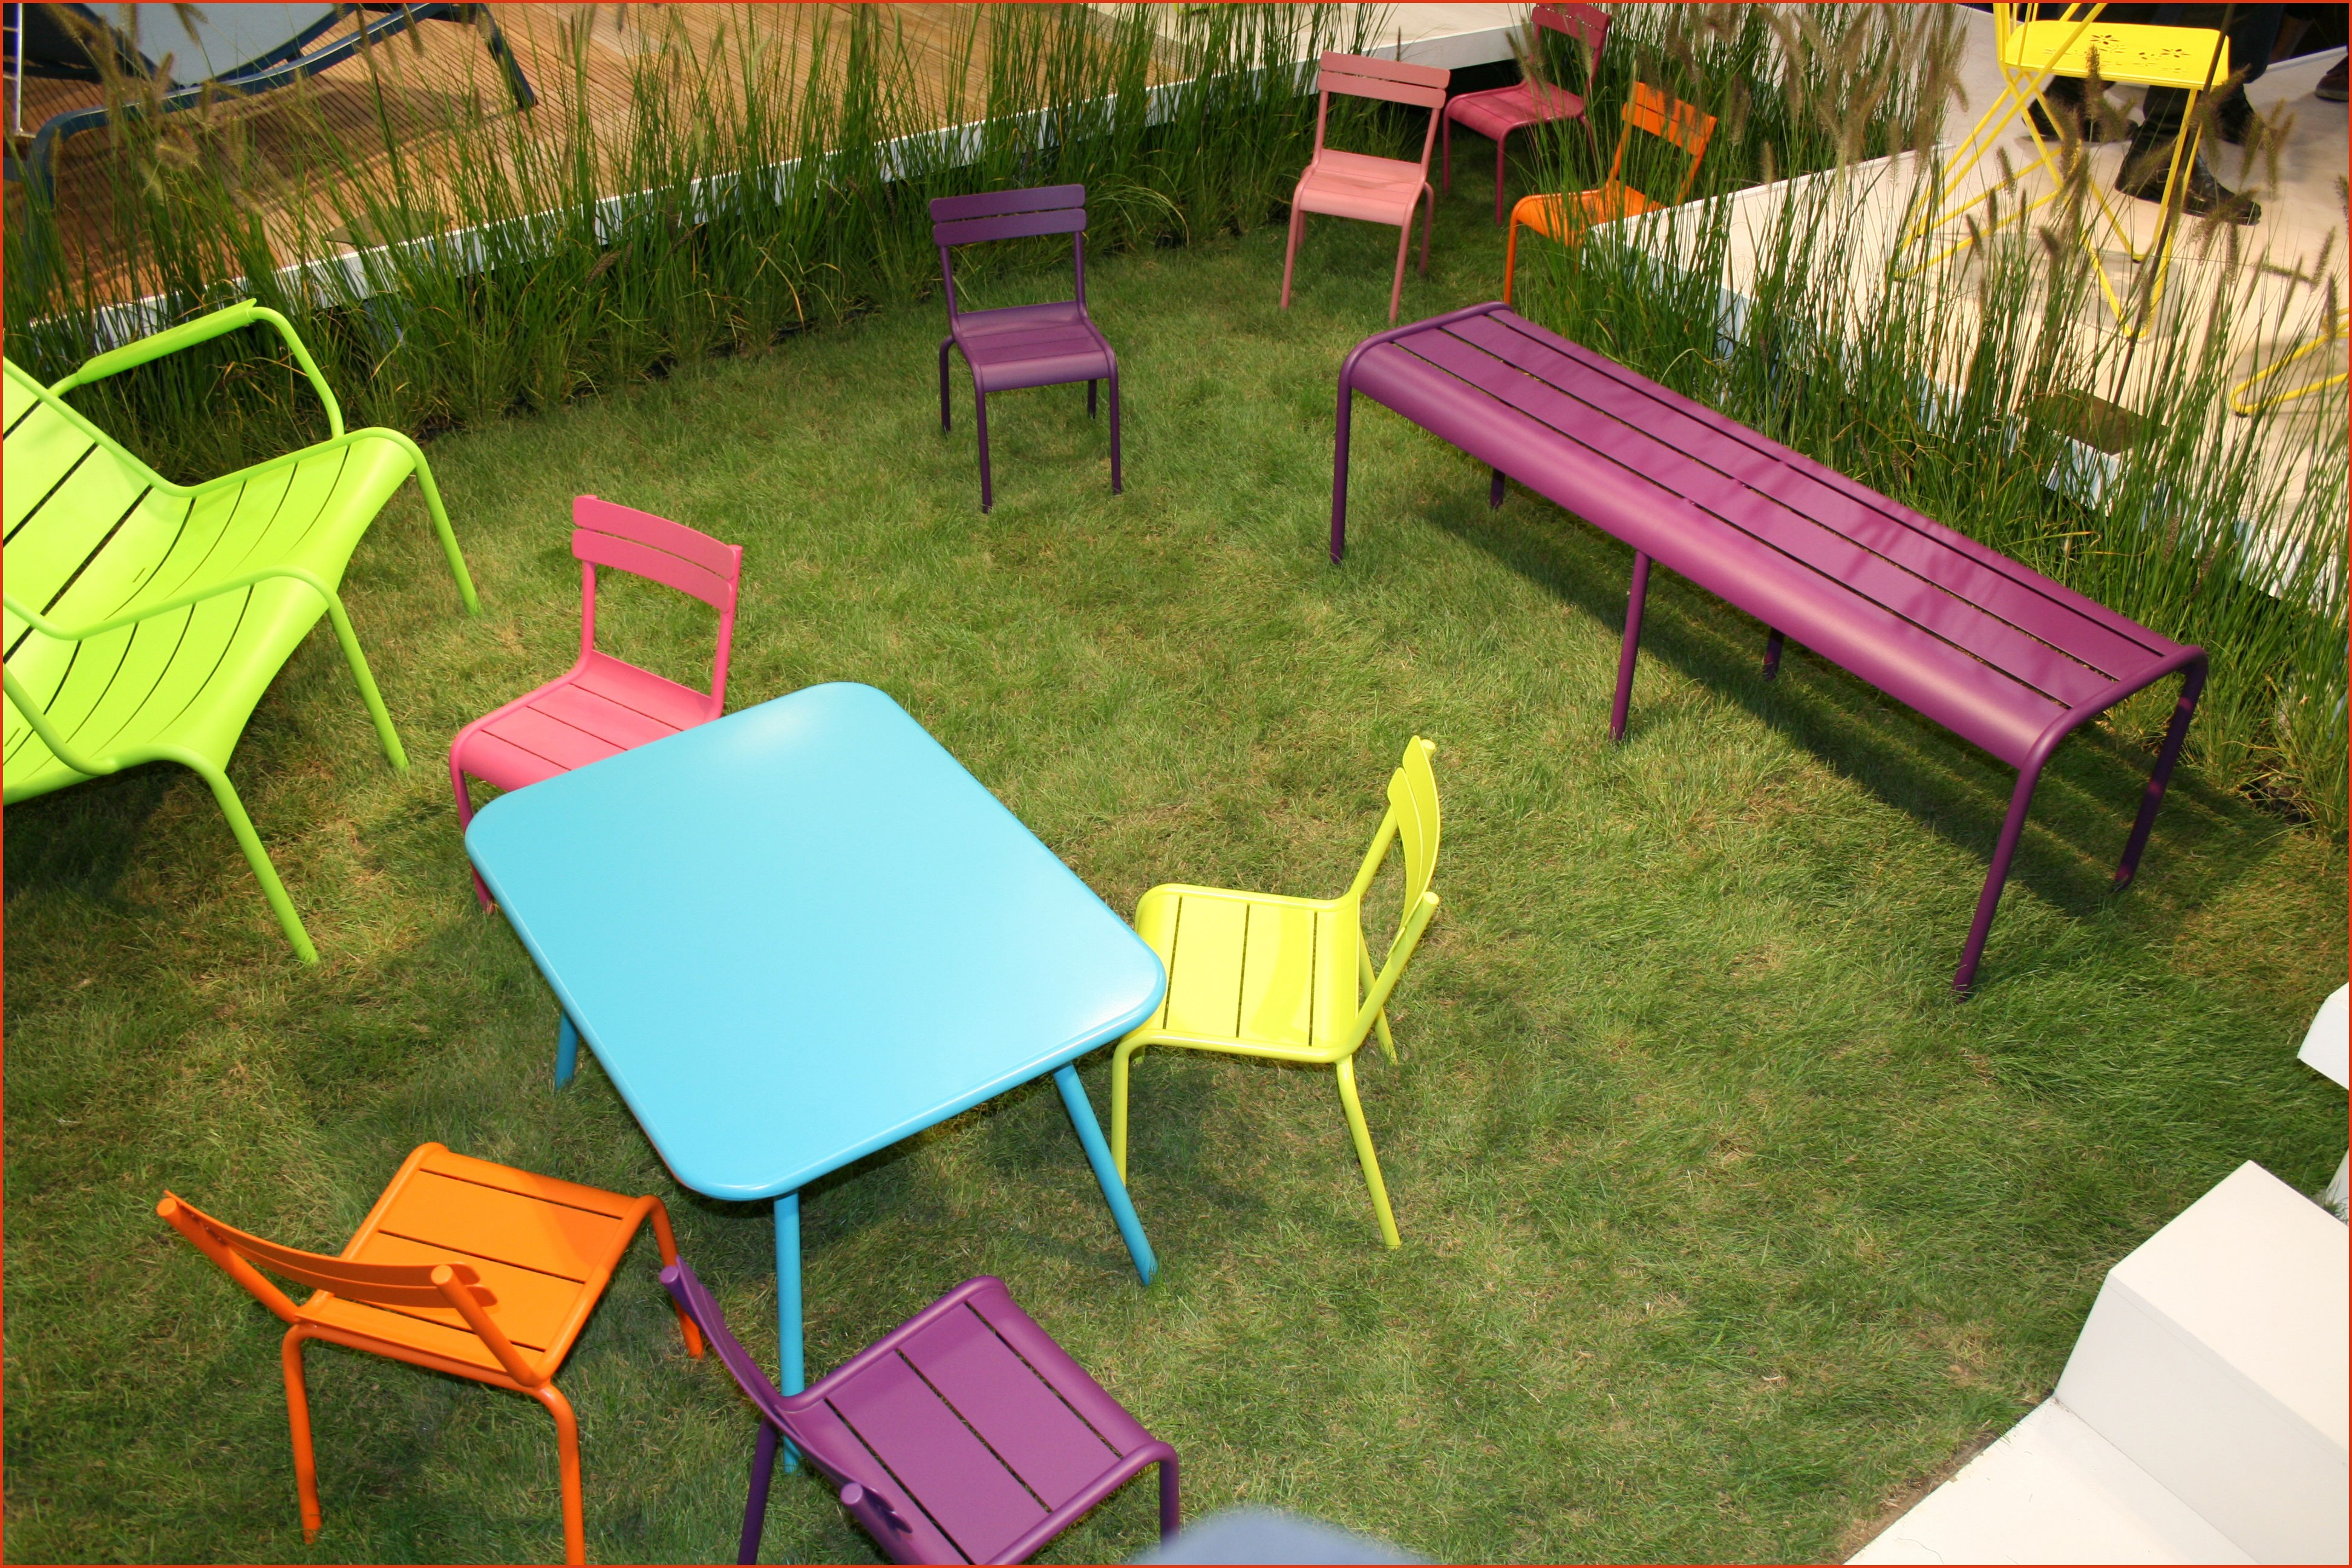 Salon de jardin couleur pas cher - Mailleraye.fr jardin